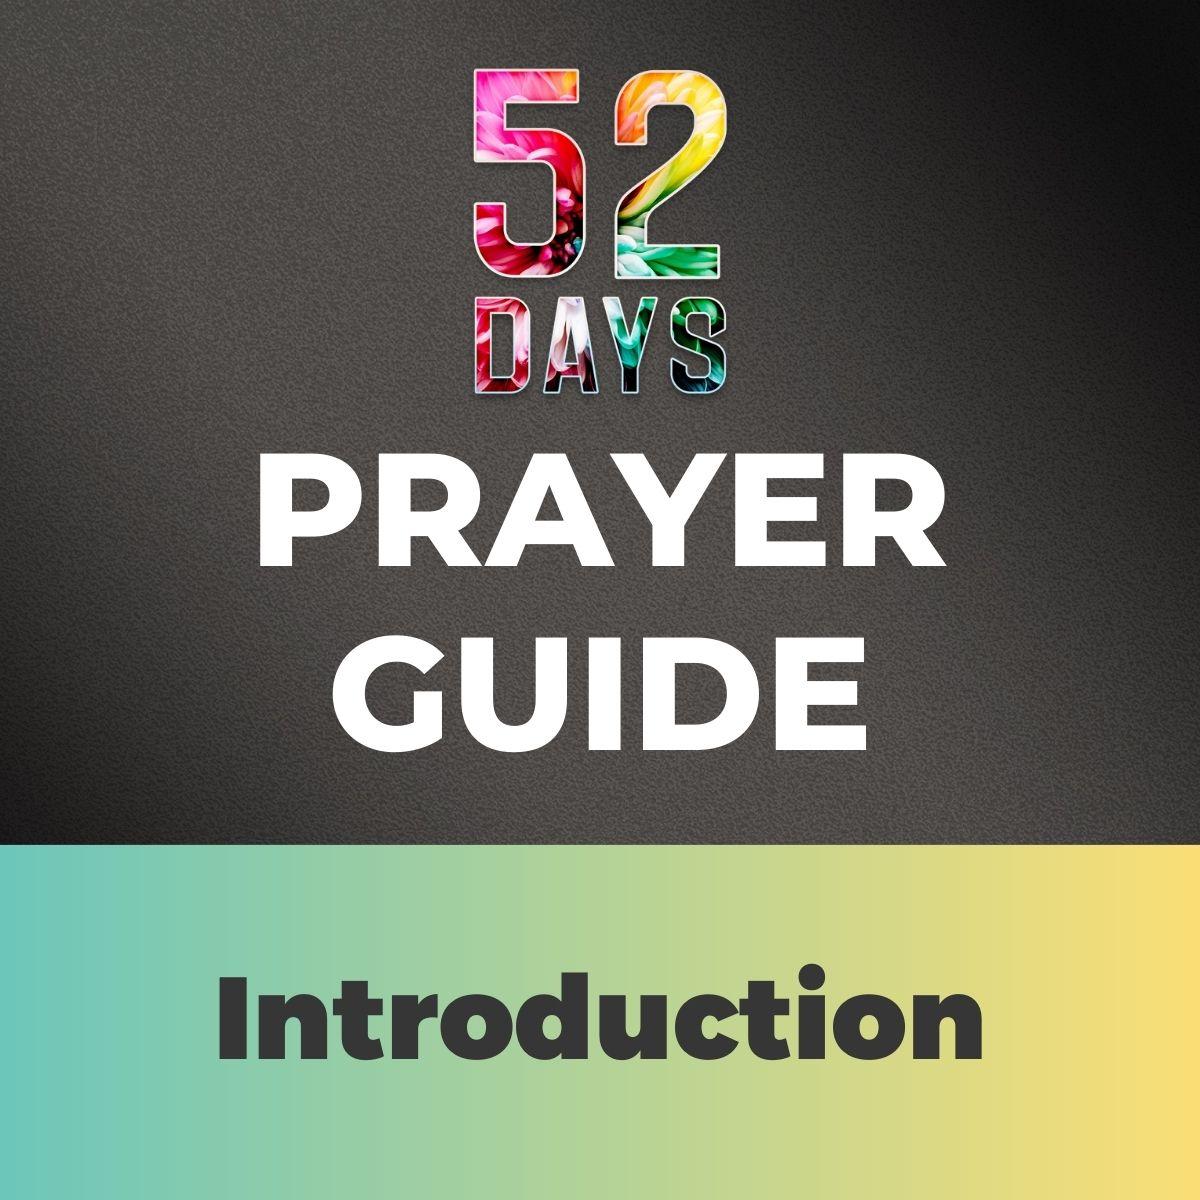 52_PrayerGuide_TILES_1